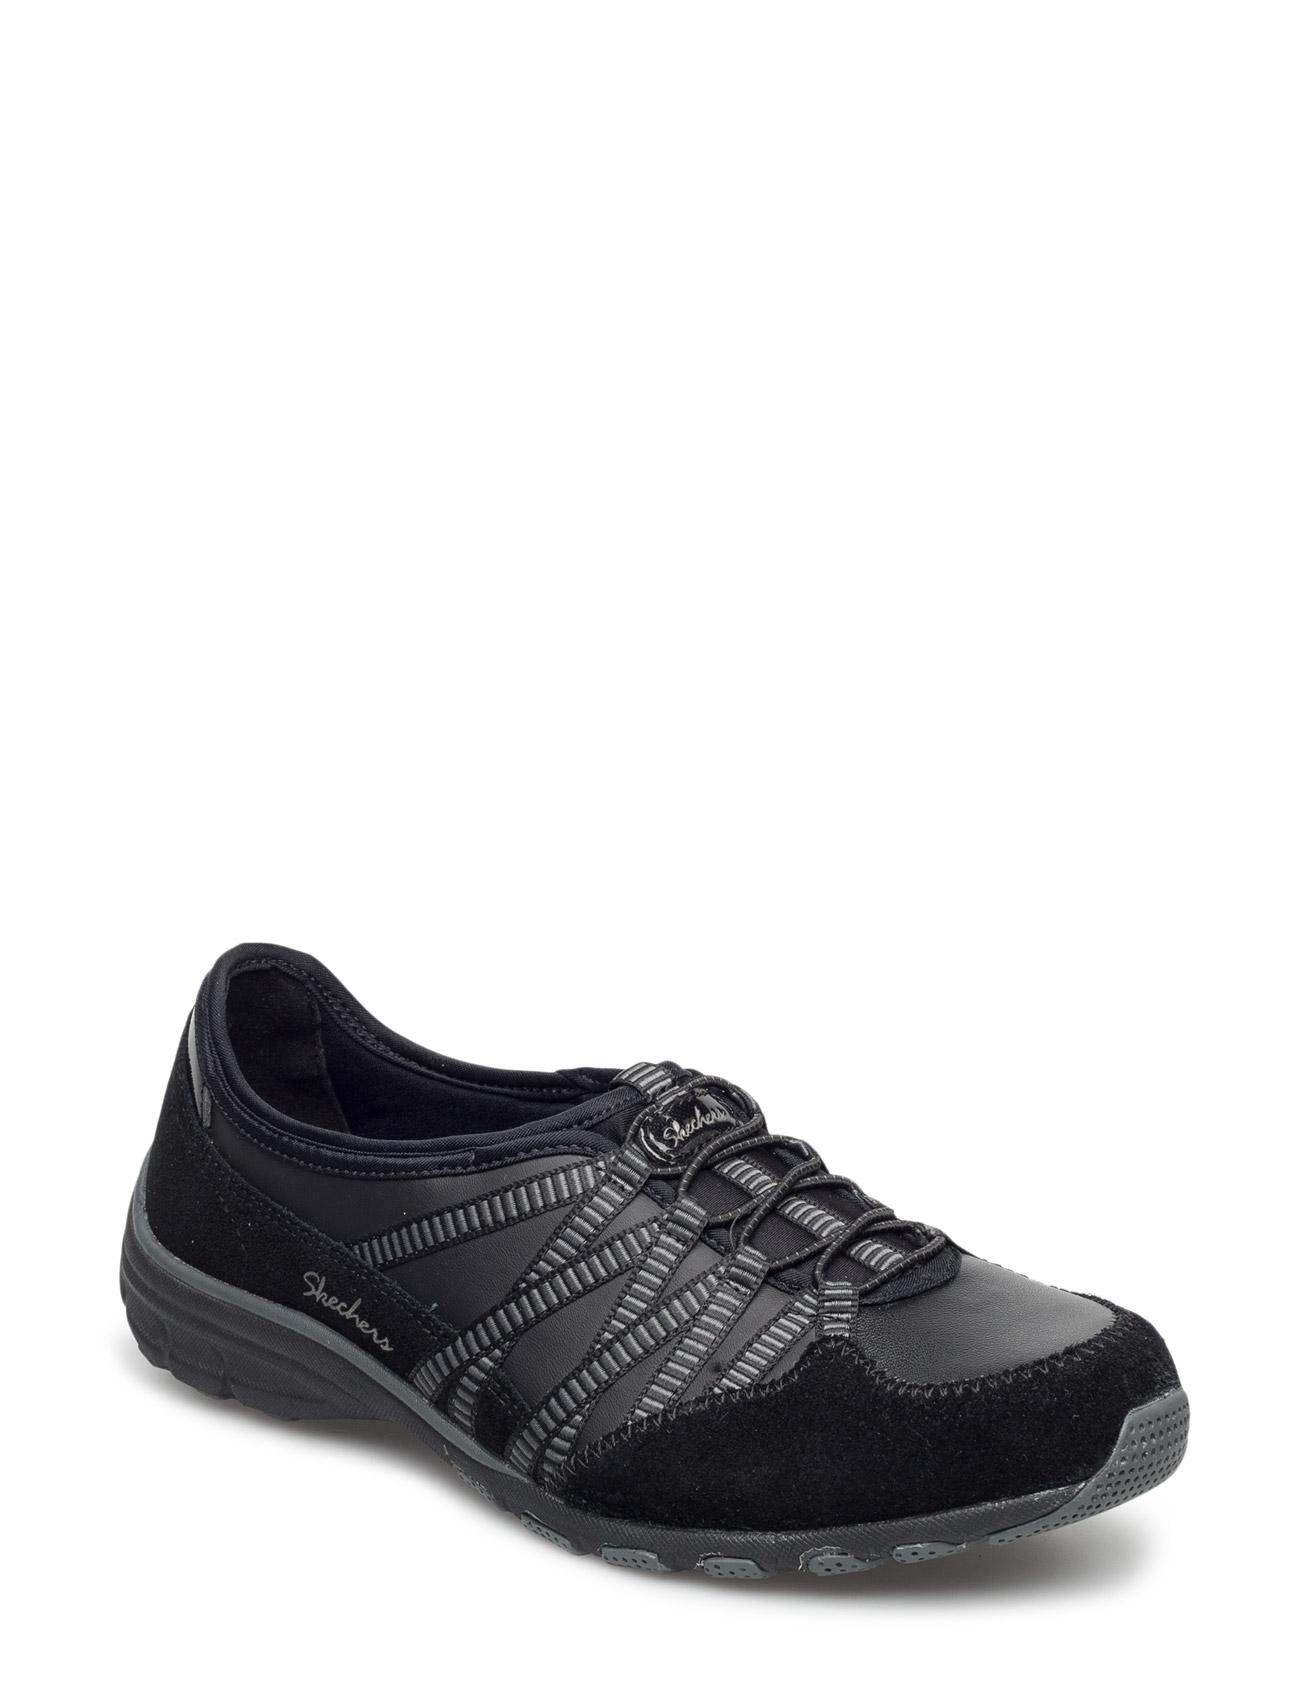 Skechers Conversations - Debate Skechers Sneakers til Kvinder i